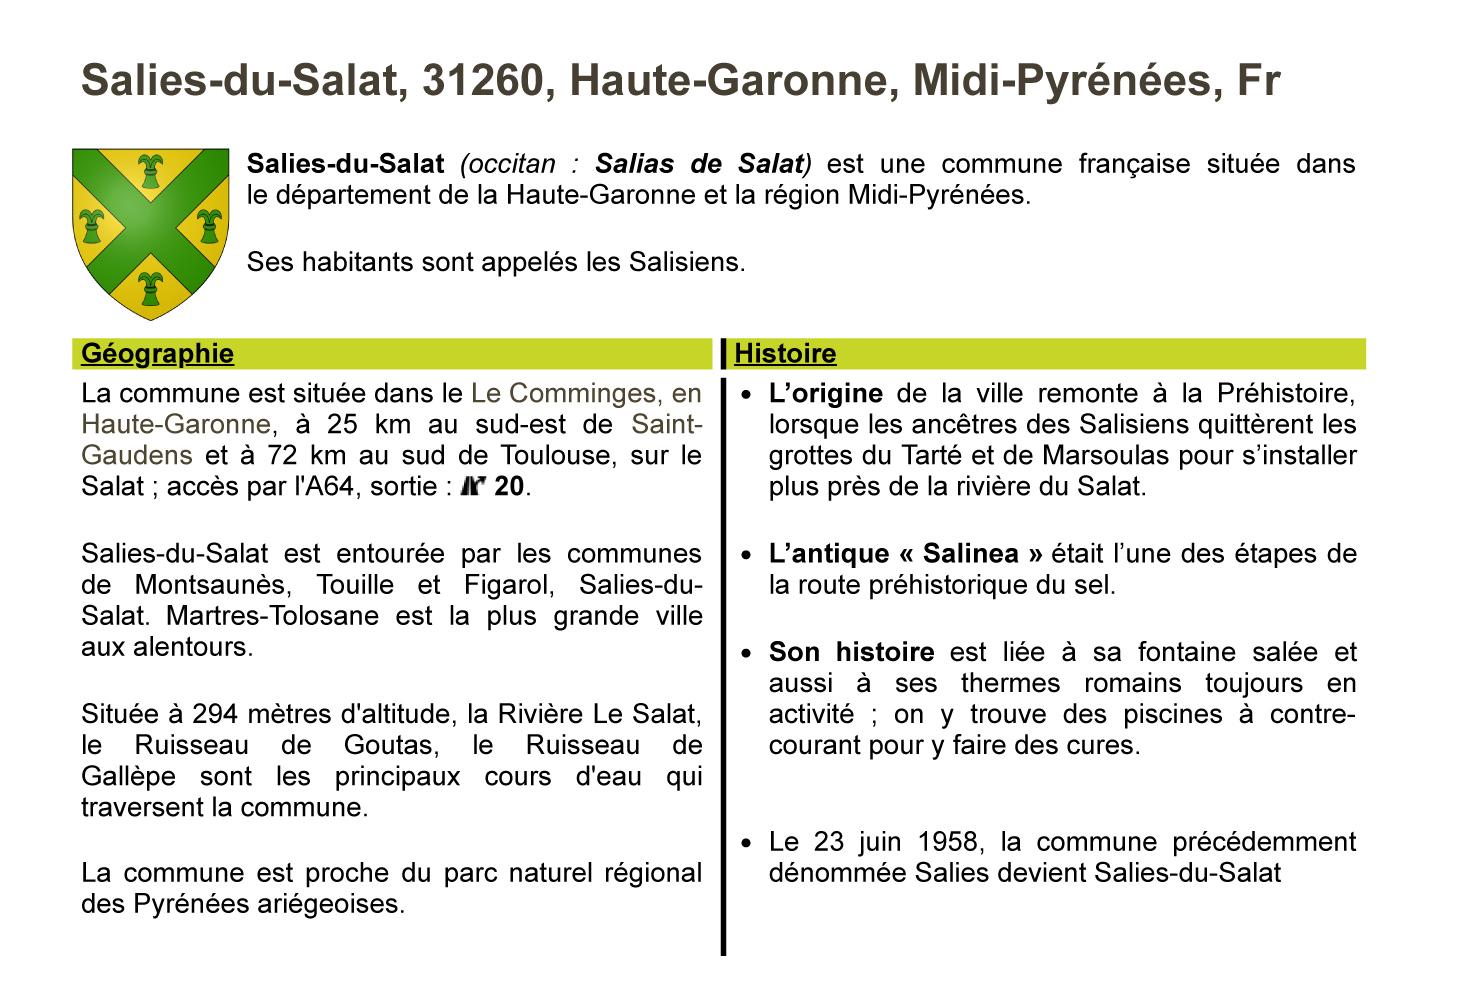 Fiche-Salies-du-Salat,31260,Haute-Garonne,Midi-Pyrénées,Fr